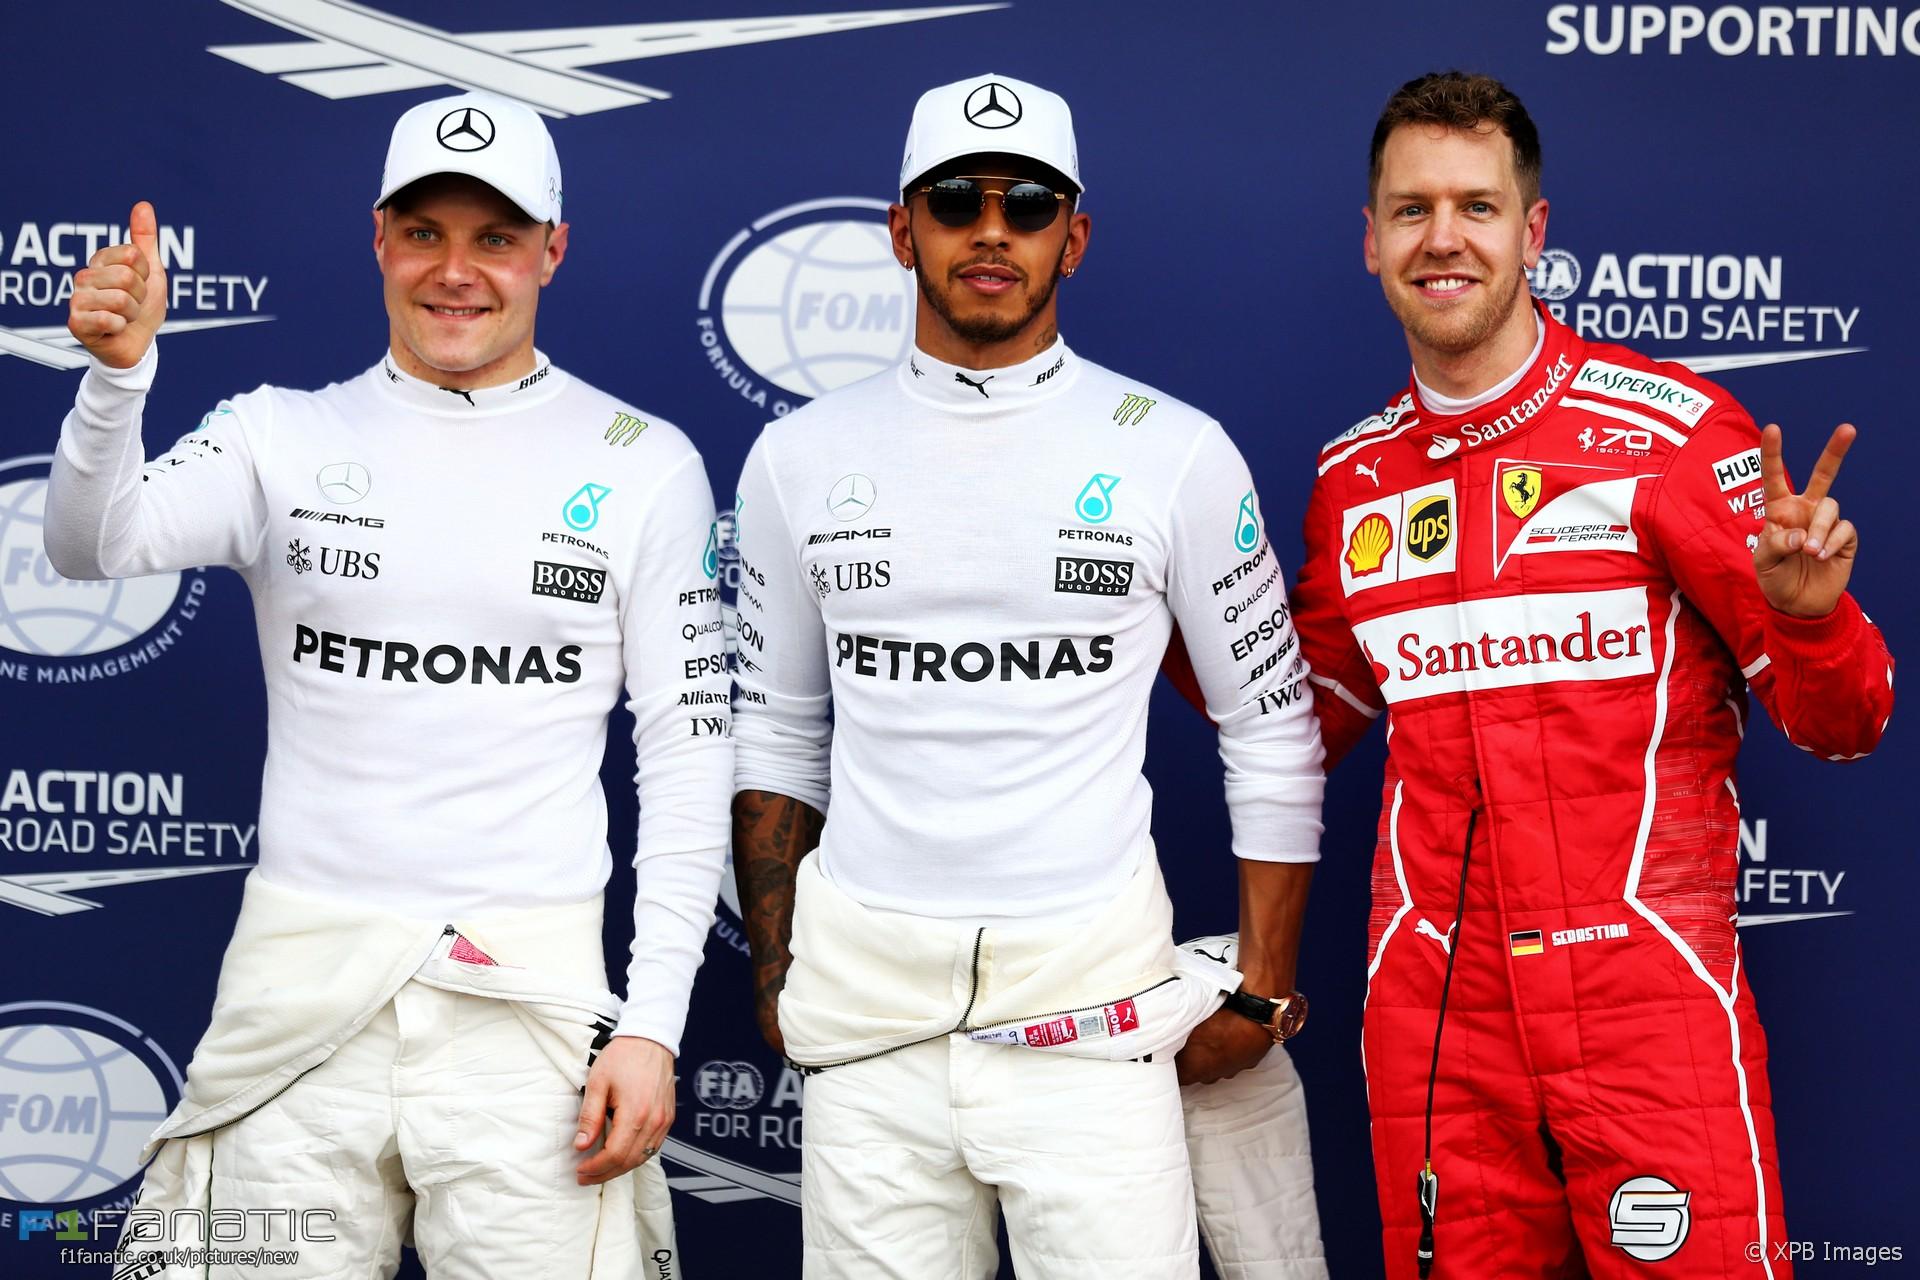 Valtteri Bottas, Lewis Hamilton, Sebastian Vettel, Albert Park, 2017